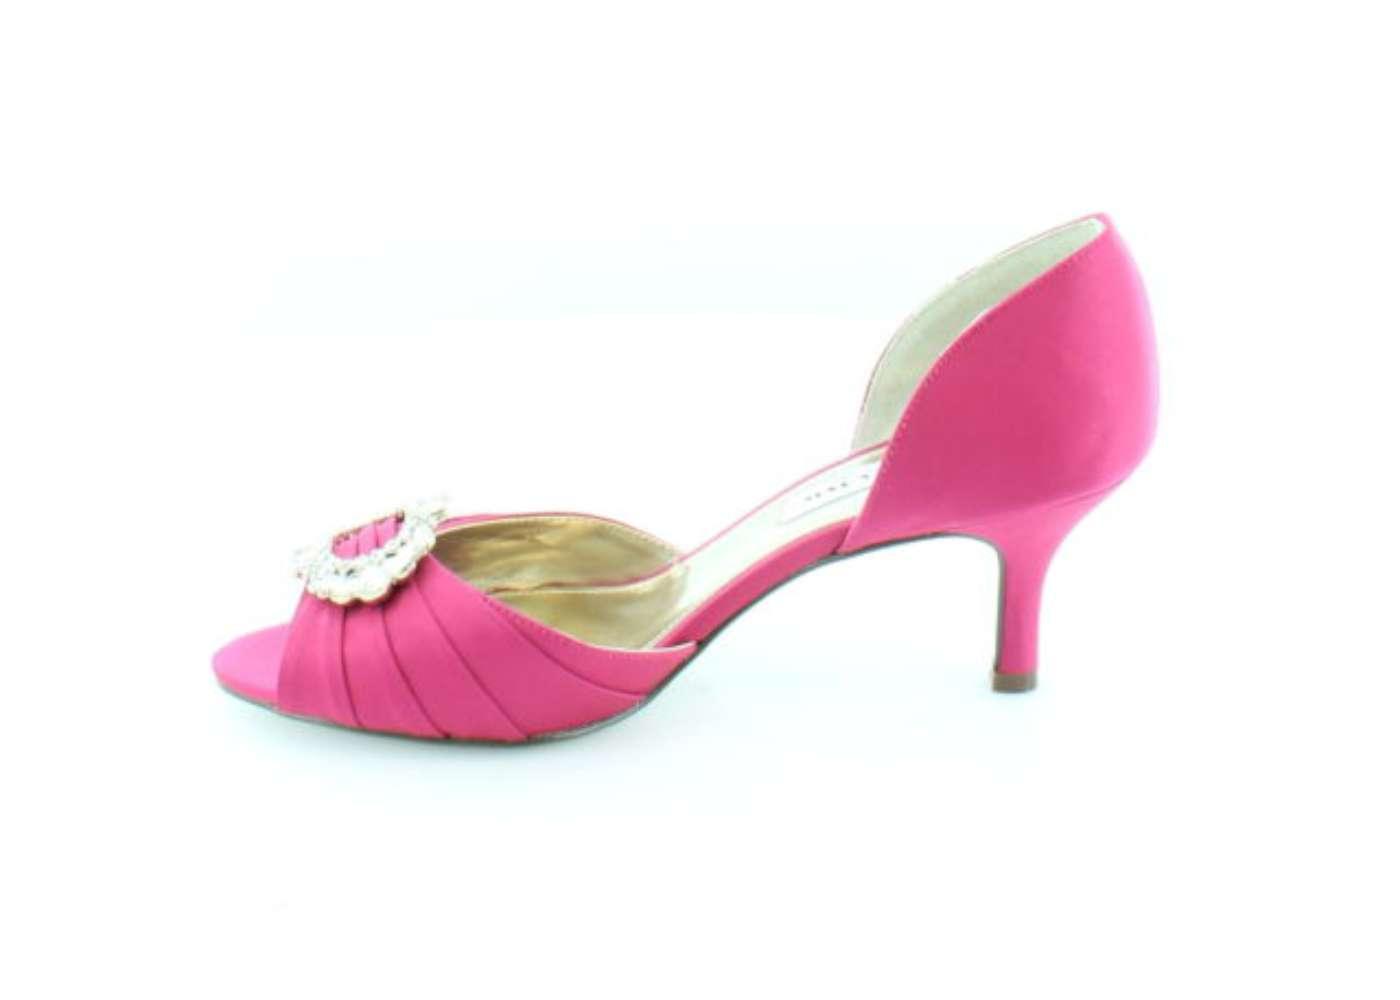 Nina Womens CRYSTAHLS Satin Open Toe Dorsay Pumps BERRY/LUSTER SA Size 7.5